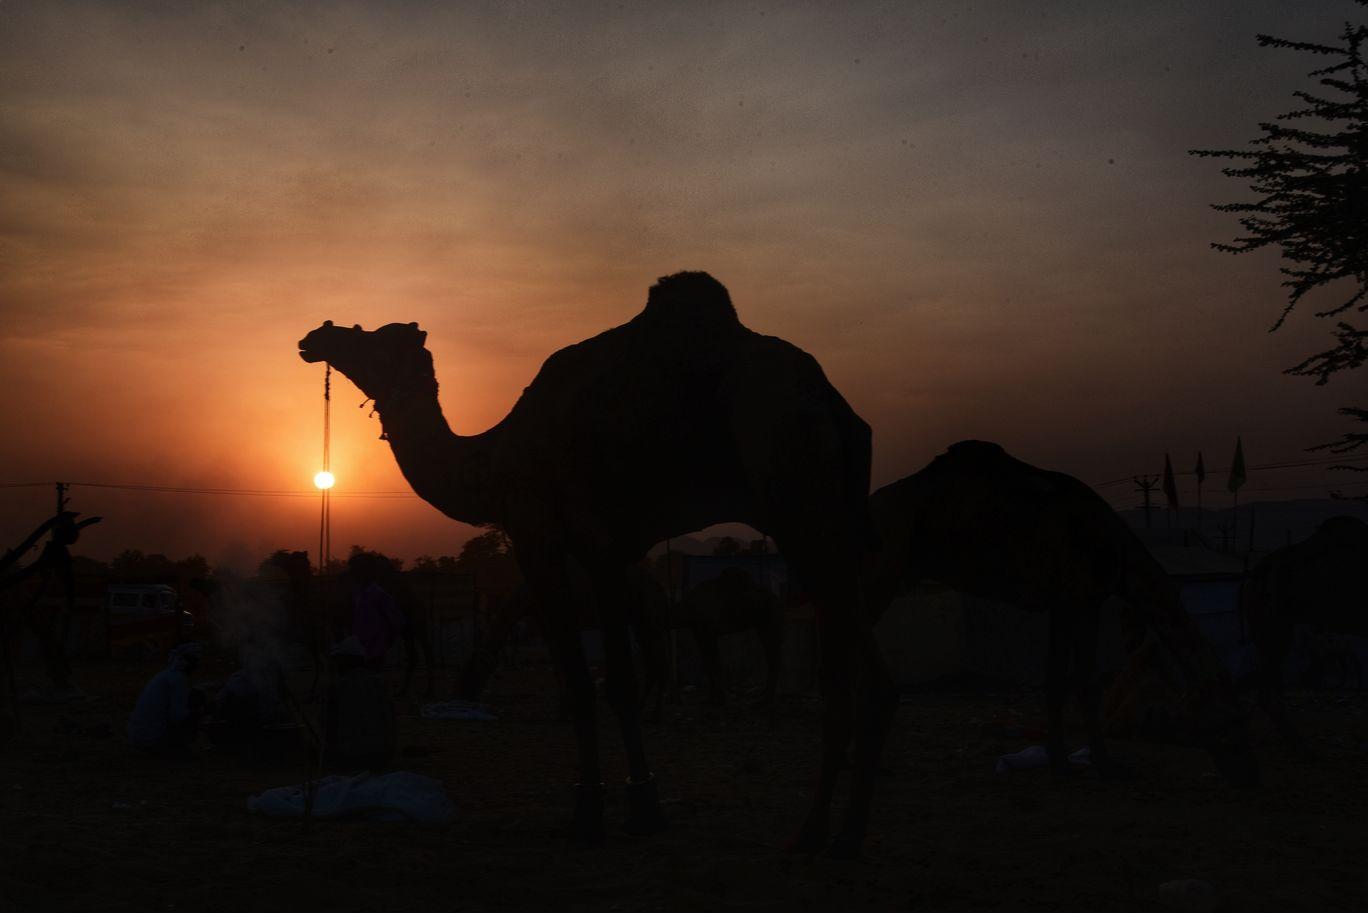 Photo of Pushkar By saurabh chauhan